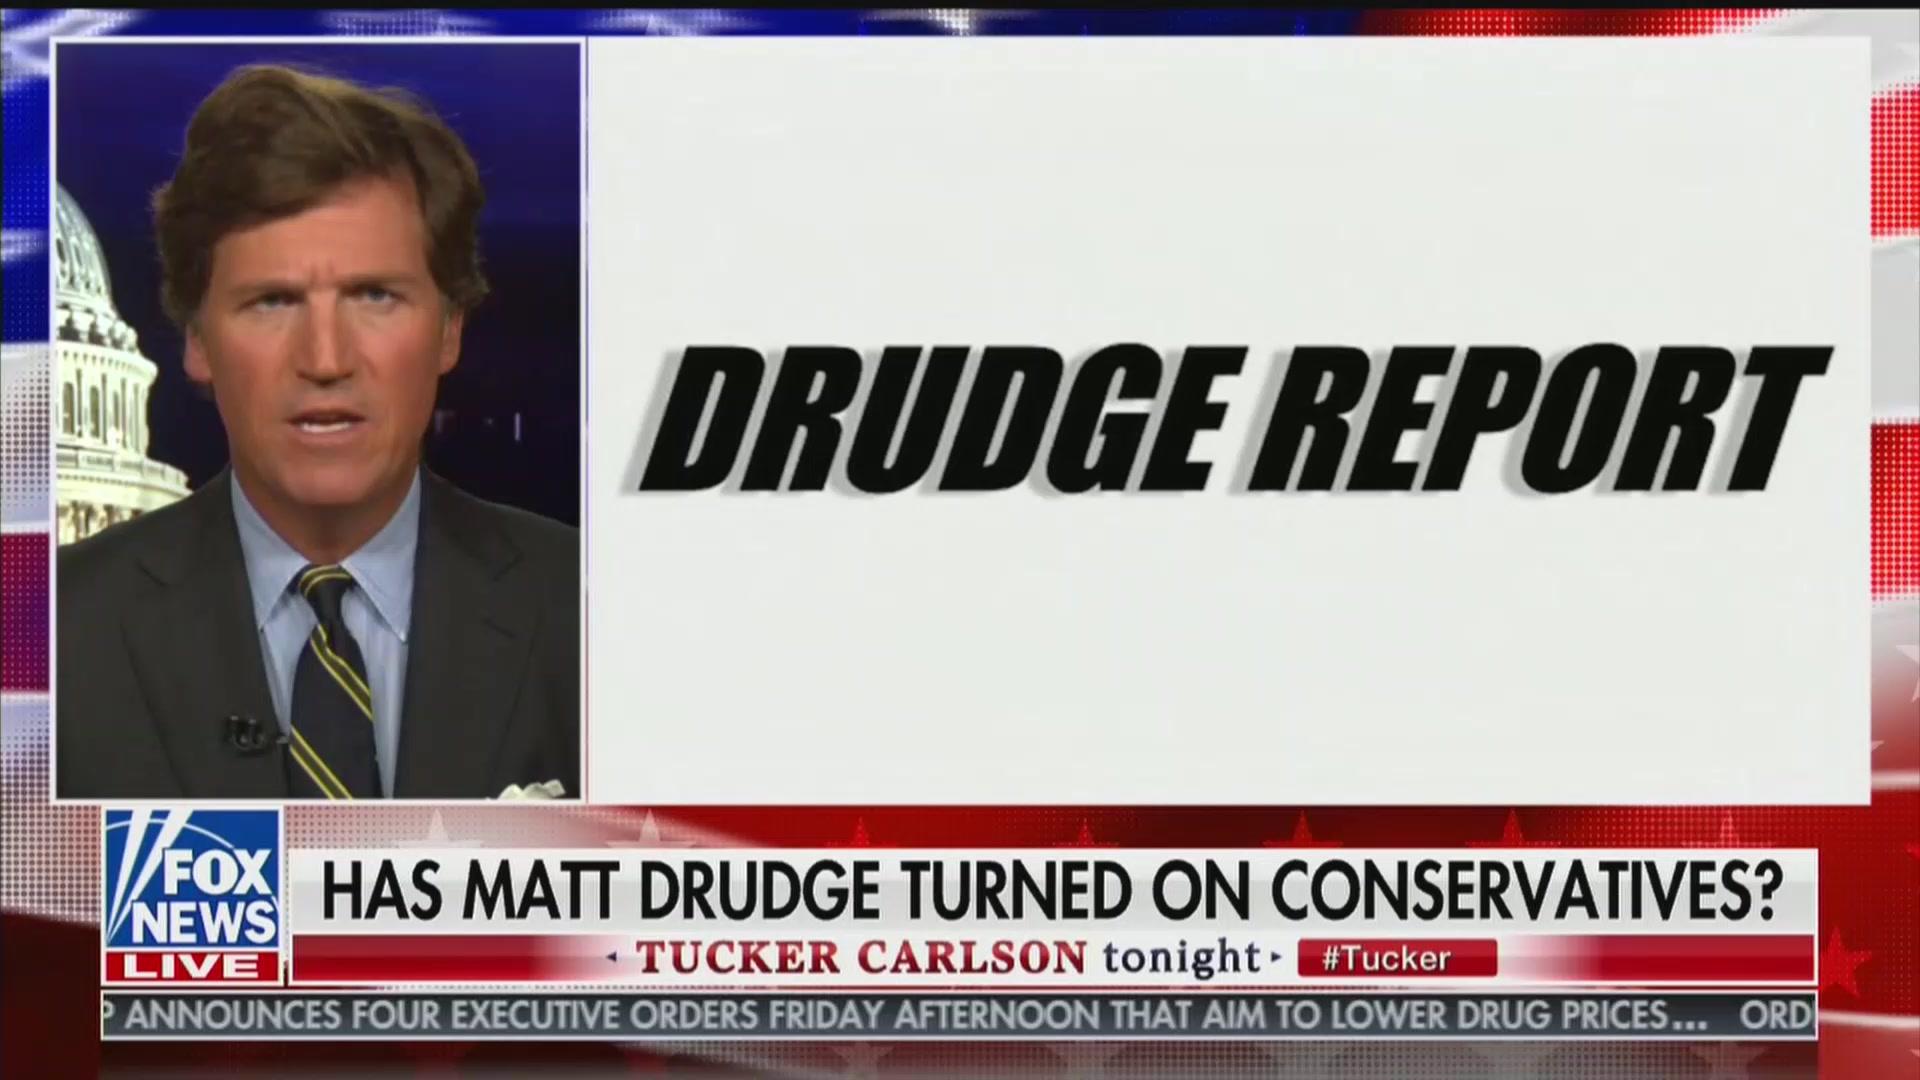 Matt Drudge Is 'Now Firmly a Man of the Progressive Left,' Tucker Carlson Claims